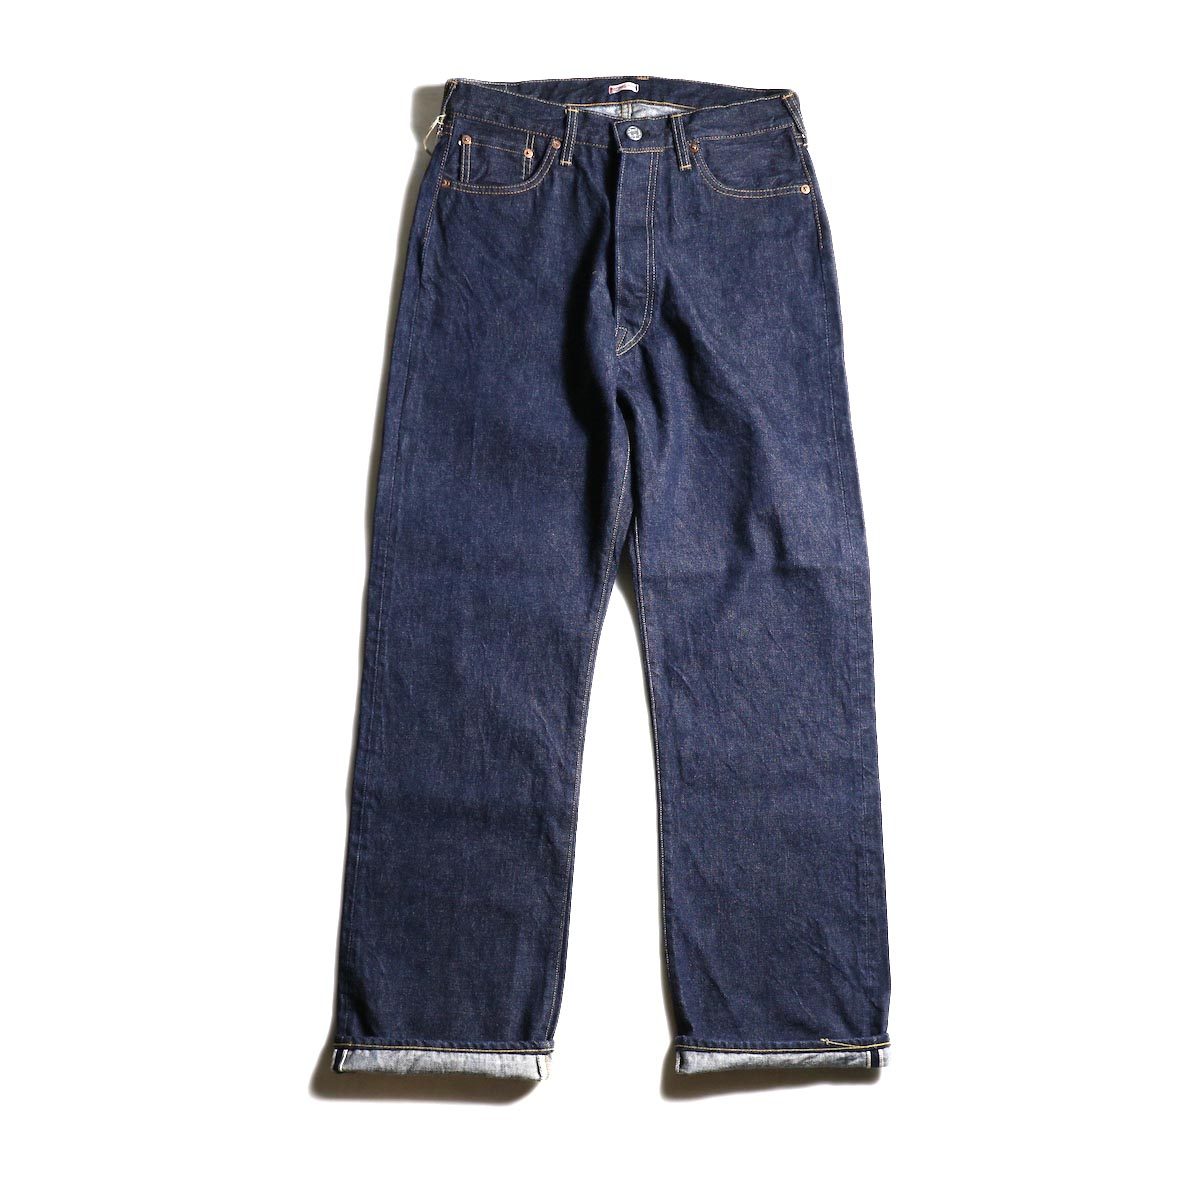 Kaptain Sunshine / Baggy Cut Straight Denim Pants -One Wash